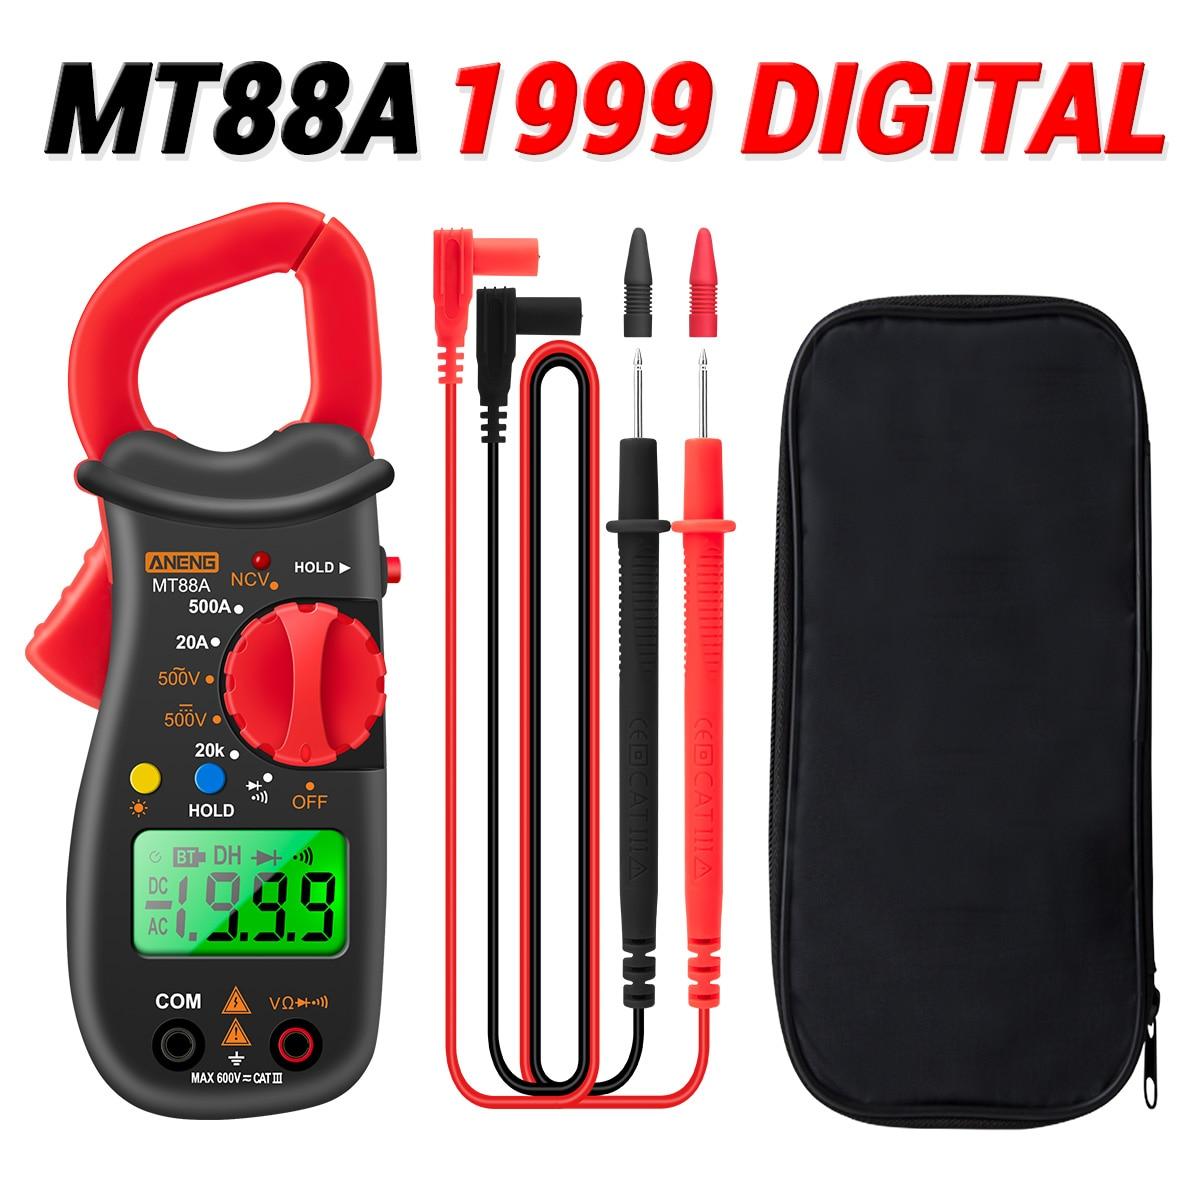 Objective Aneng Mt88a Clamp Meter Multimeter Lcd Digital Universal Meter 1999 Counts Auto Range Handheld Dc/ac Voltage Voltmeter